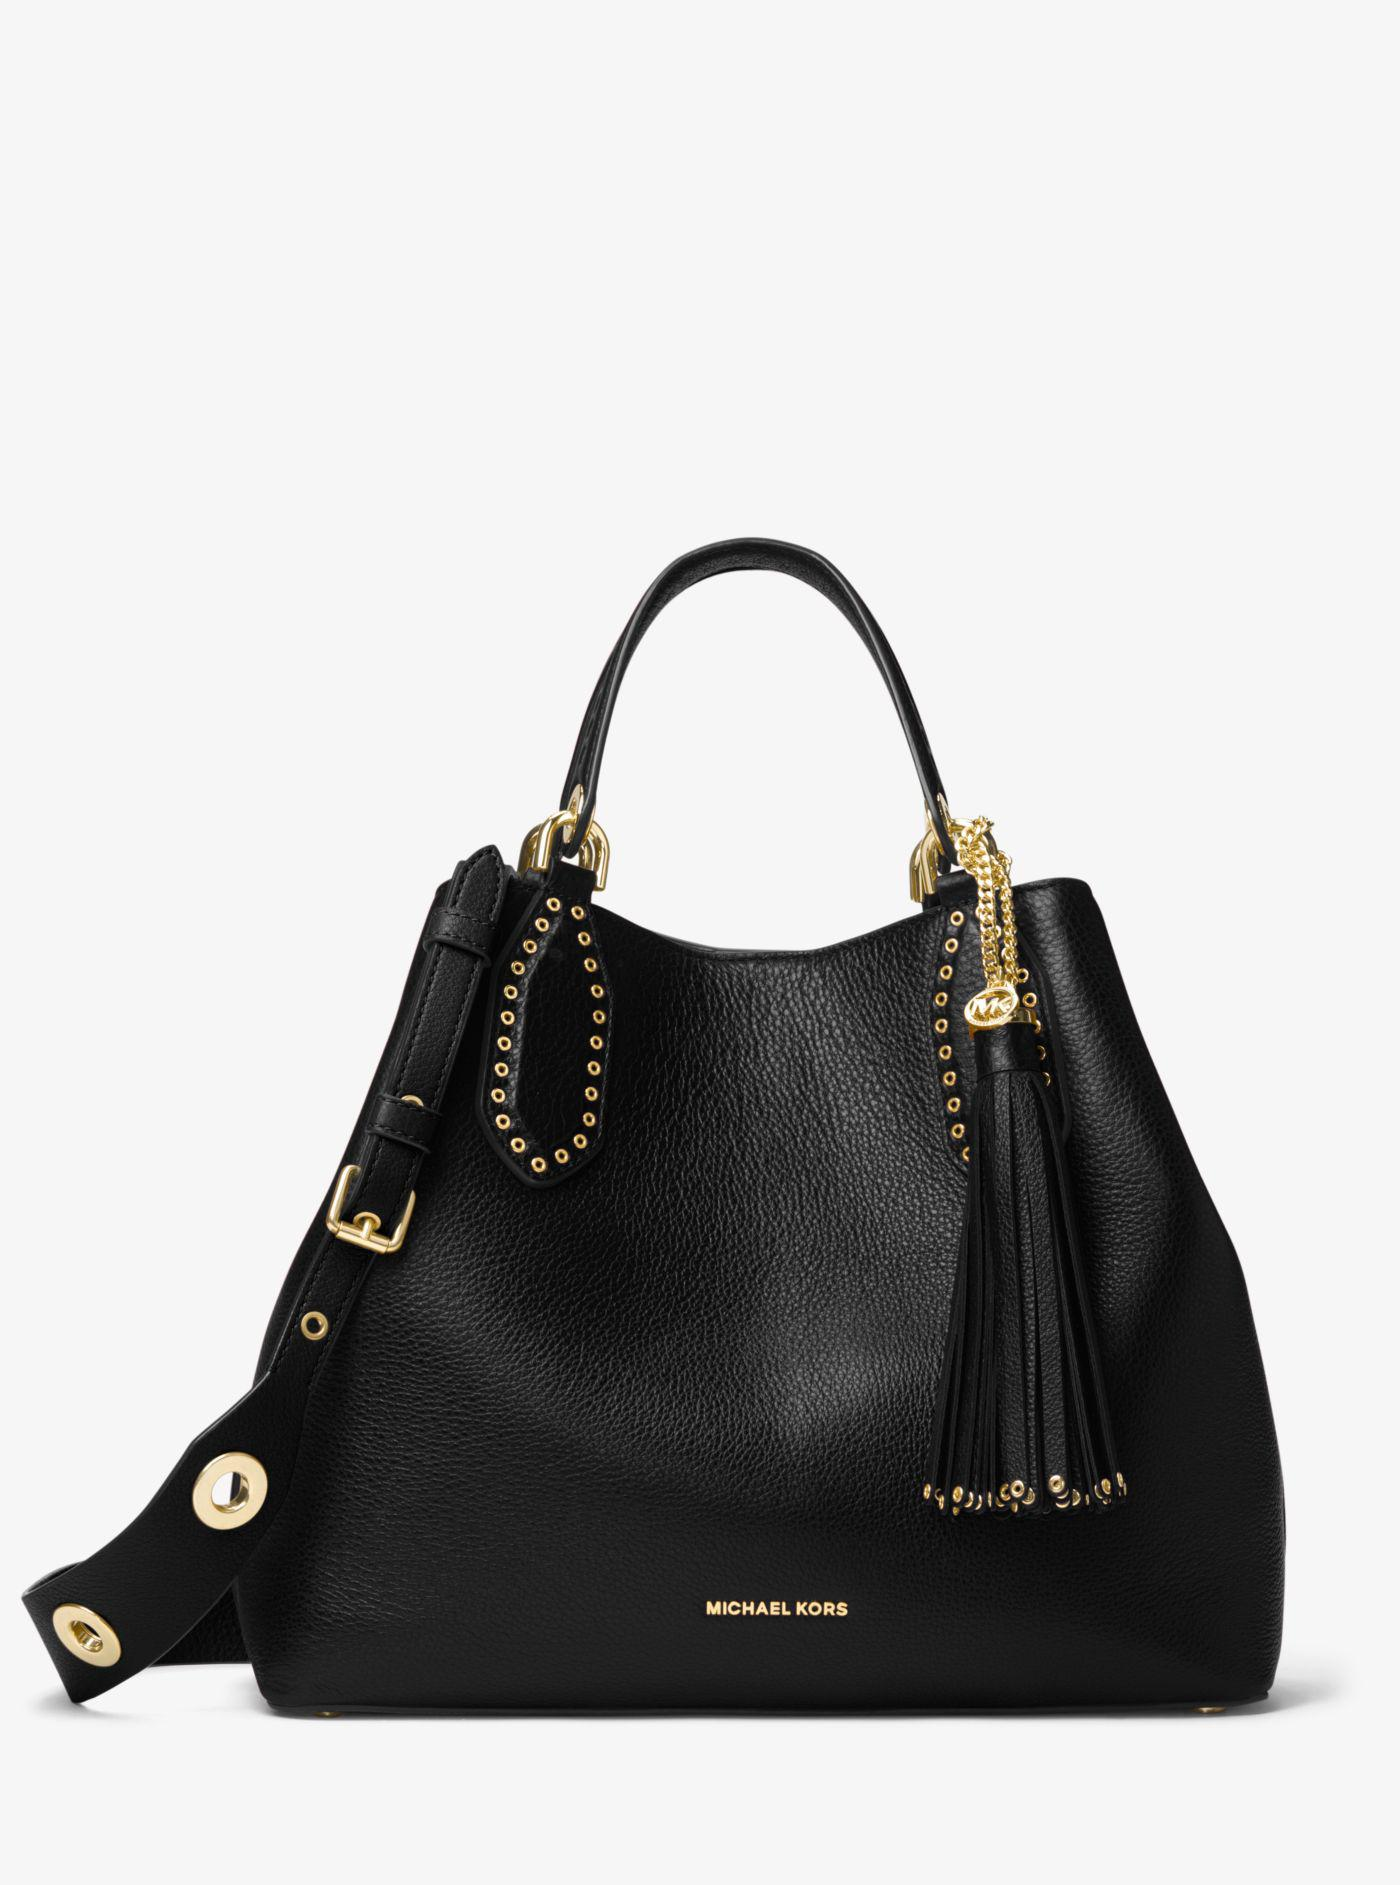 0cc9582425d60 Michael Kors - Black Brooklyn Large Leather Satchel - Lyst. View fullscreen